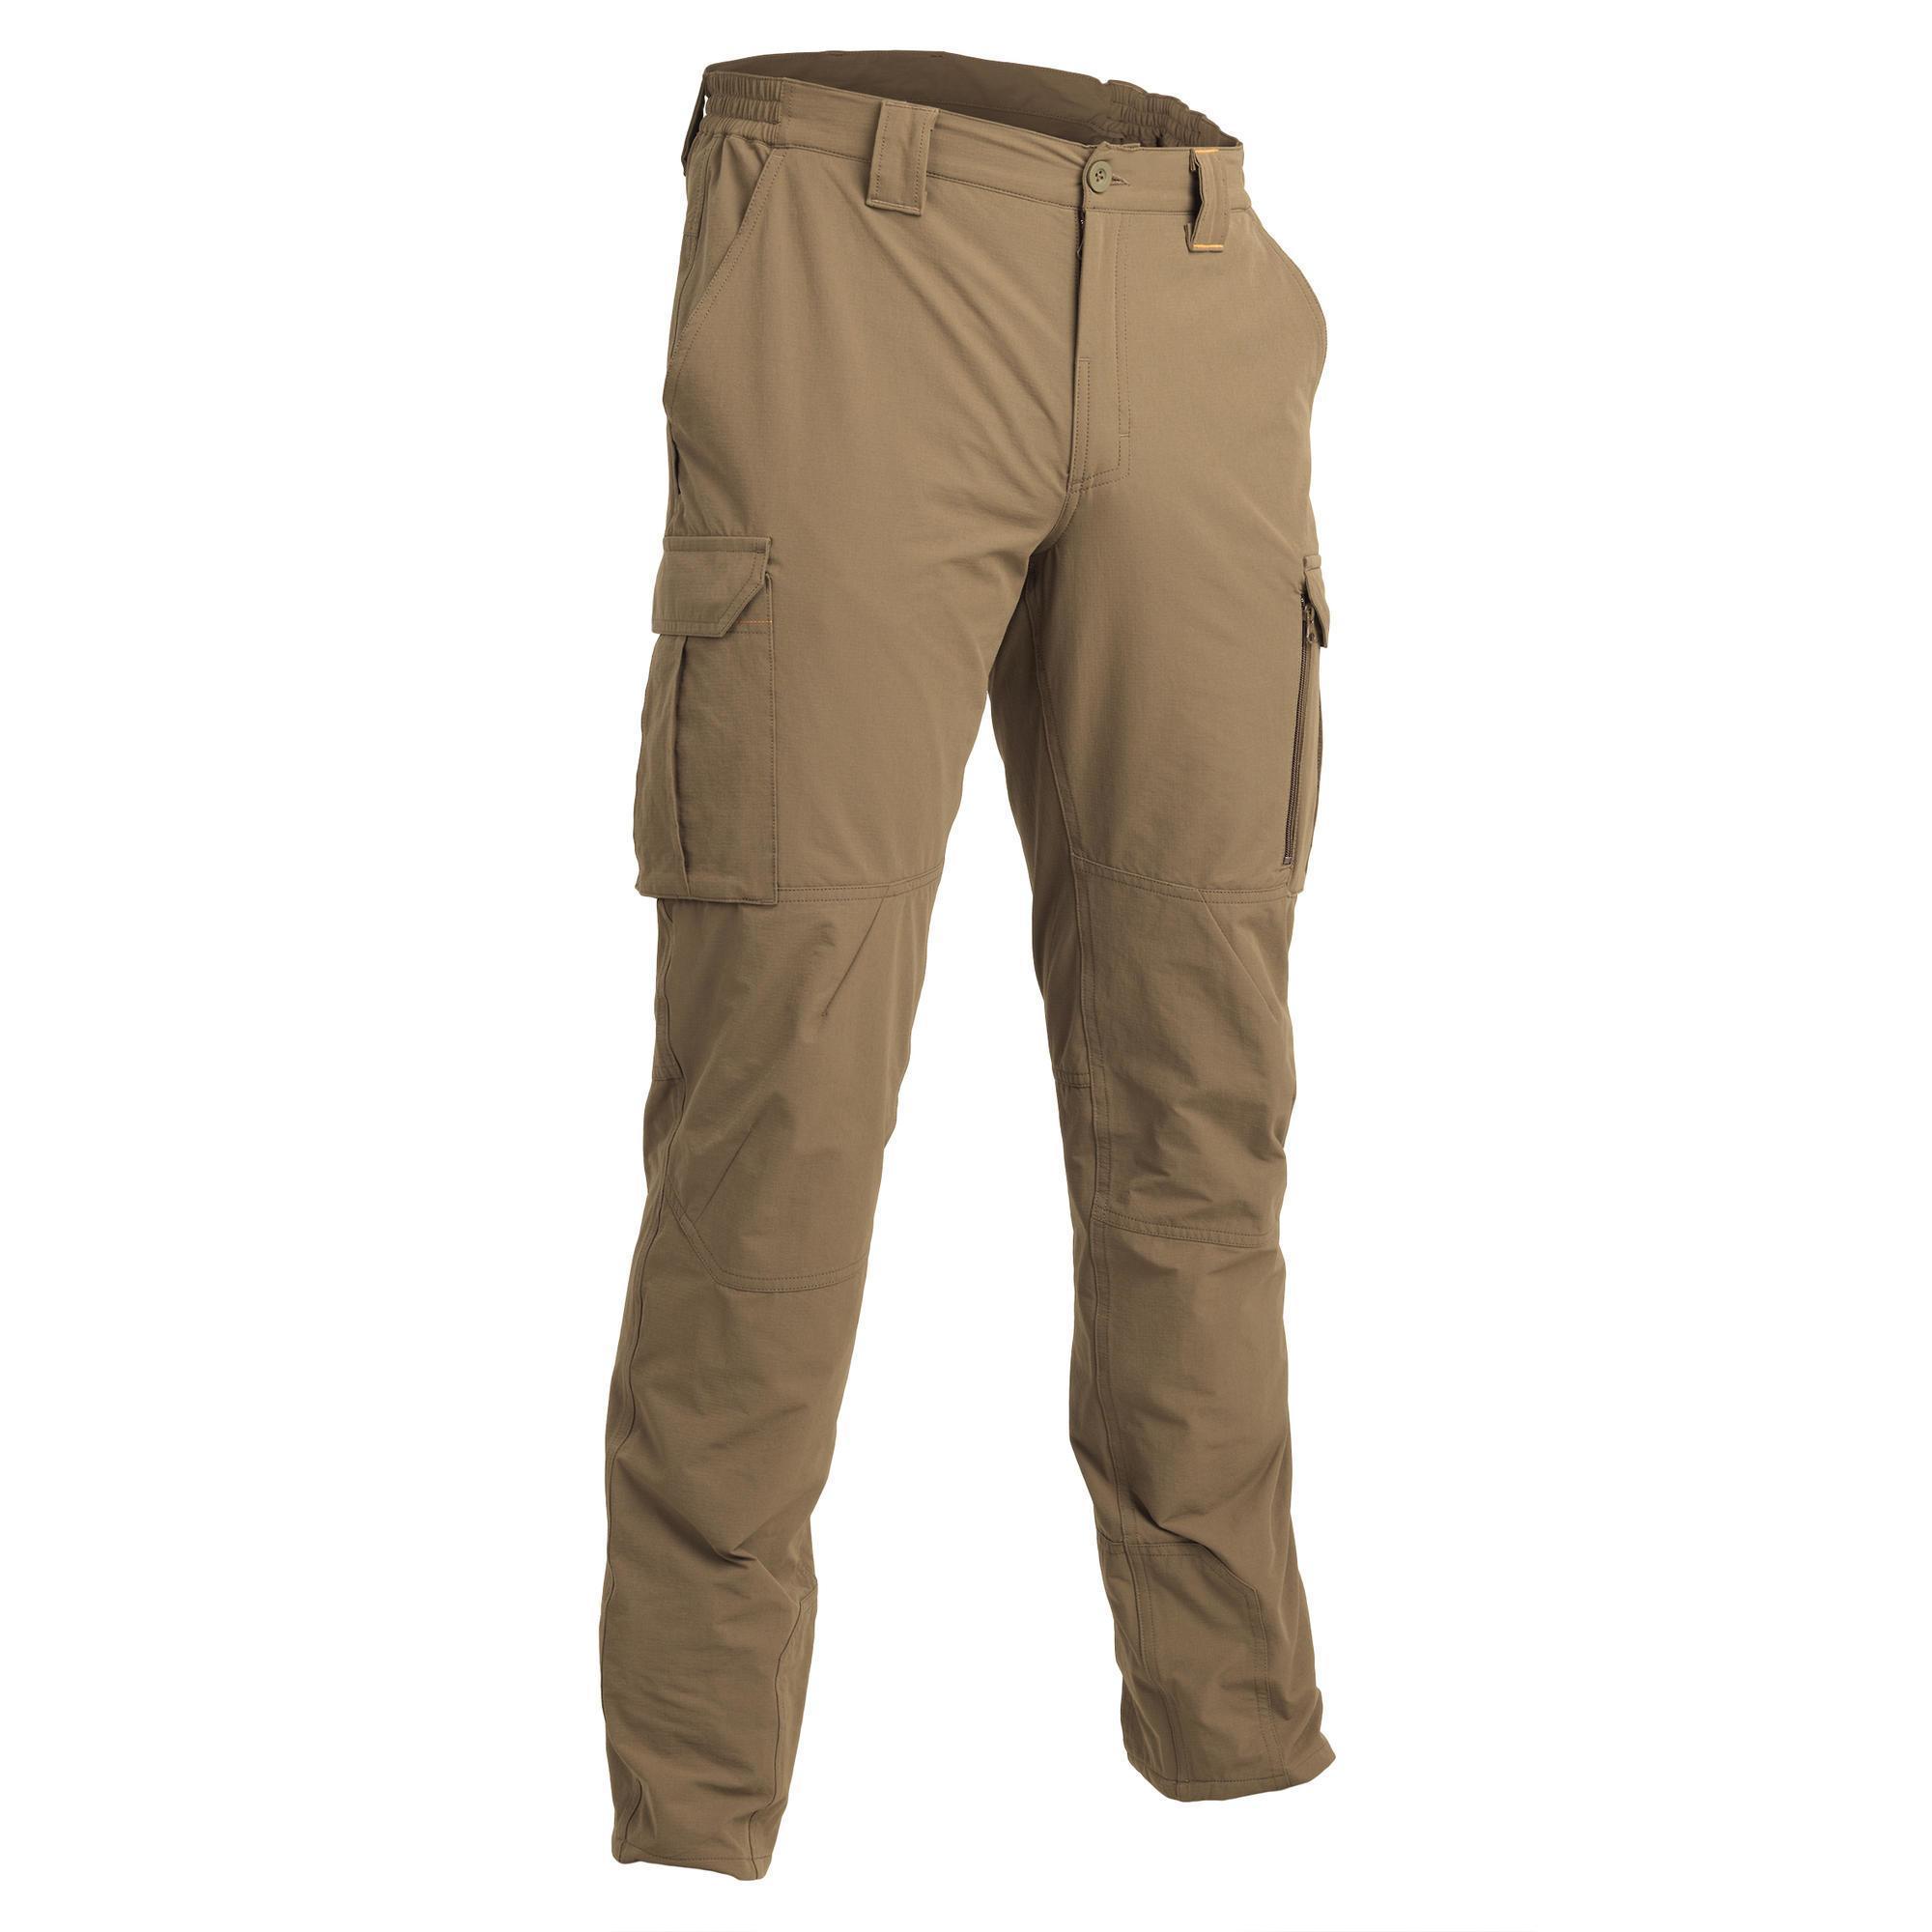 Jagdhose leicht 500 atmungsaktiv   Sportbekleidung > Sporthosen > Trekkinghosen   Solognac